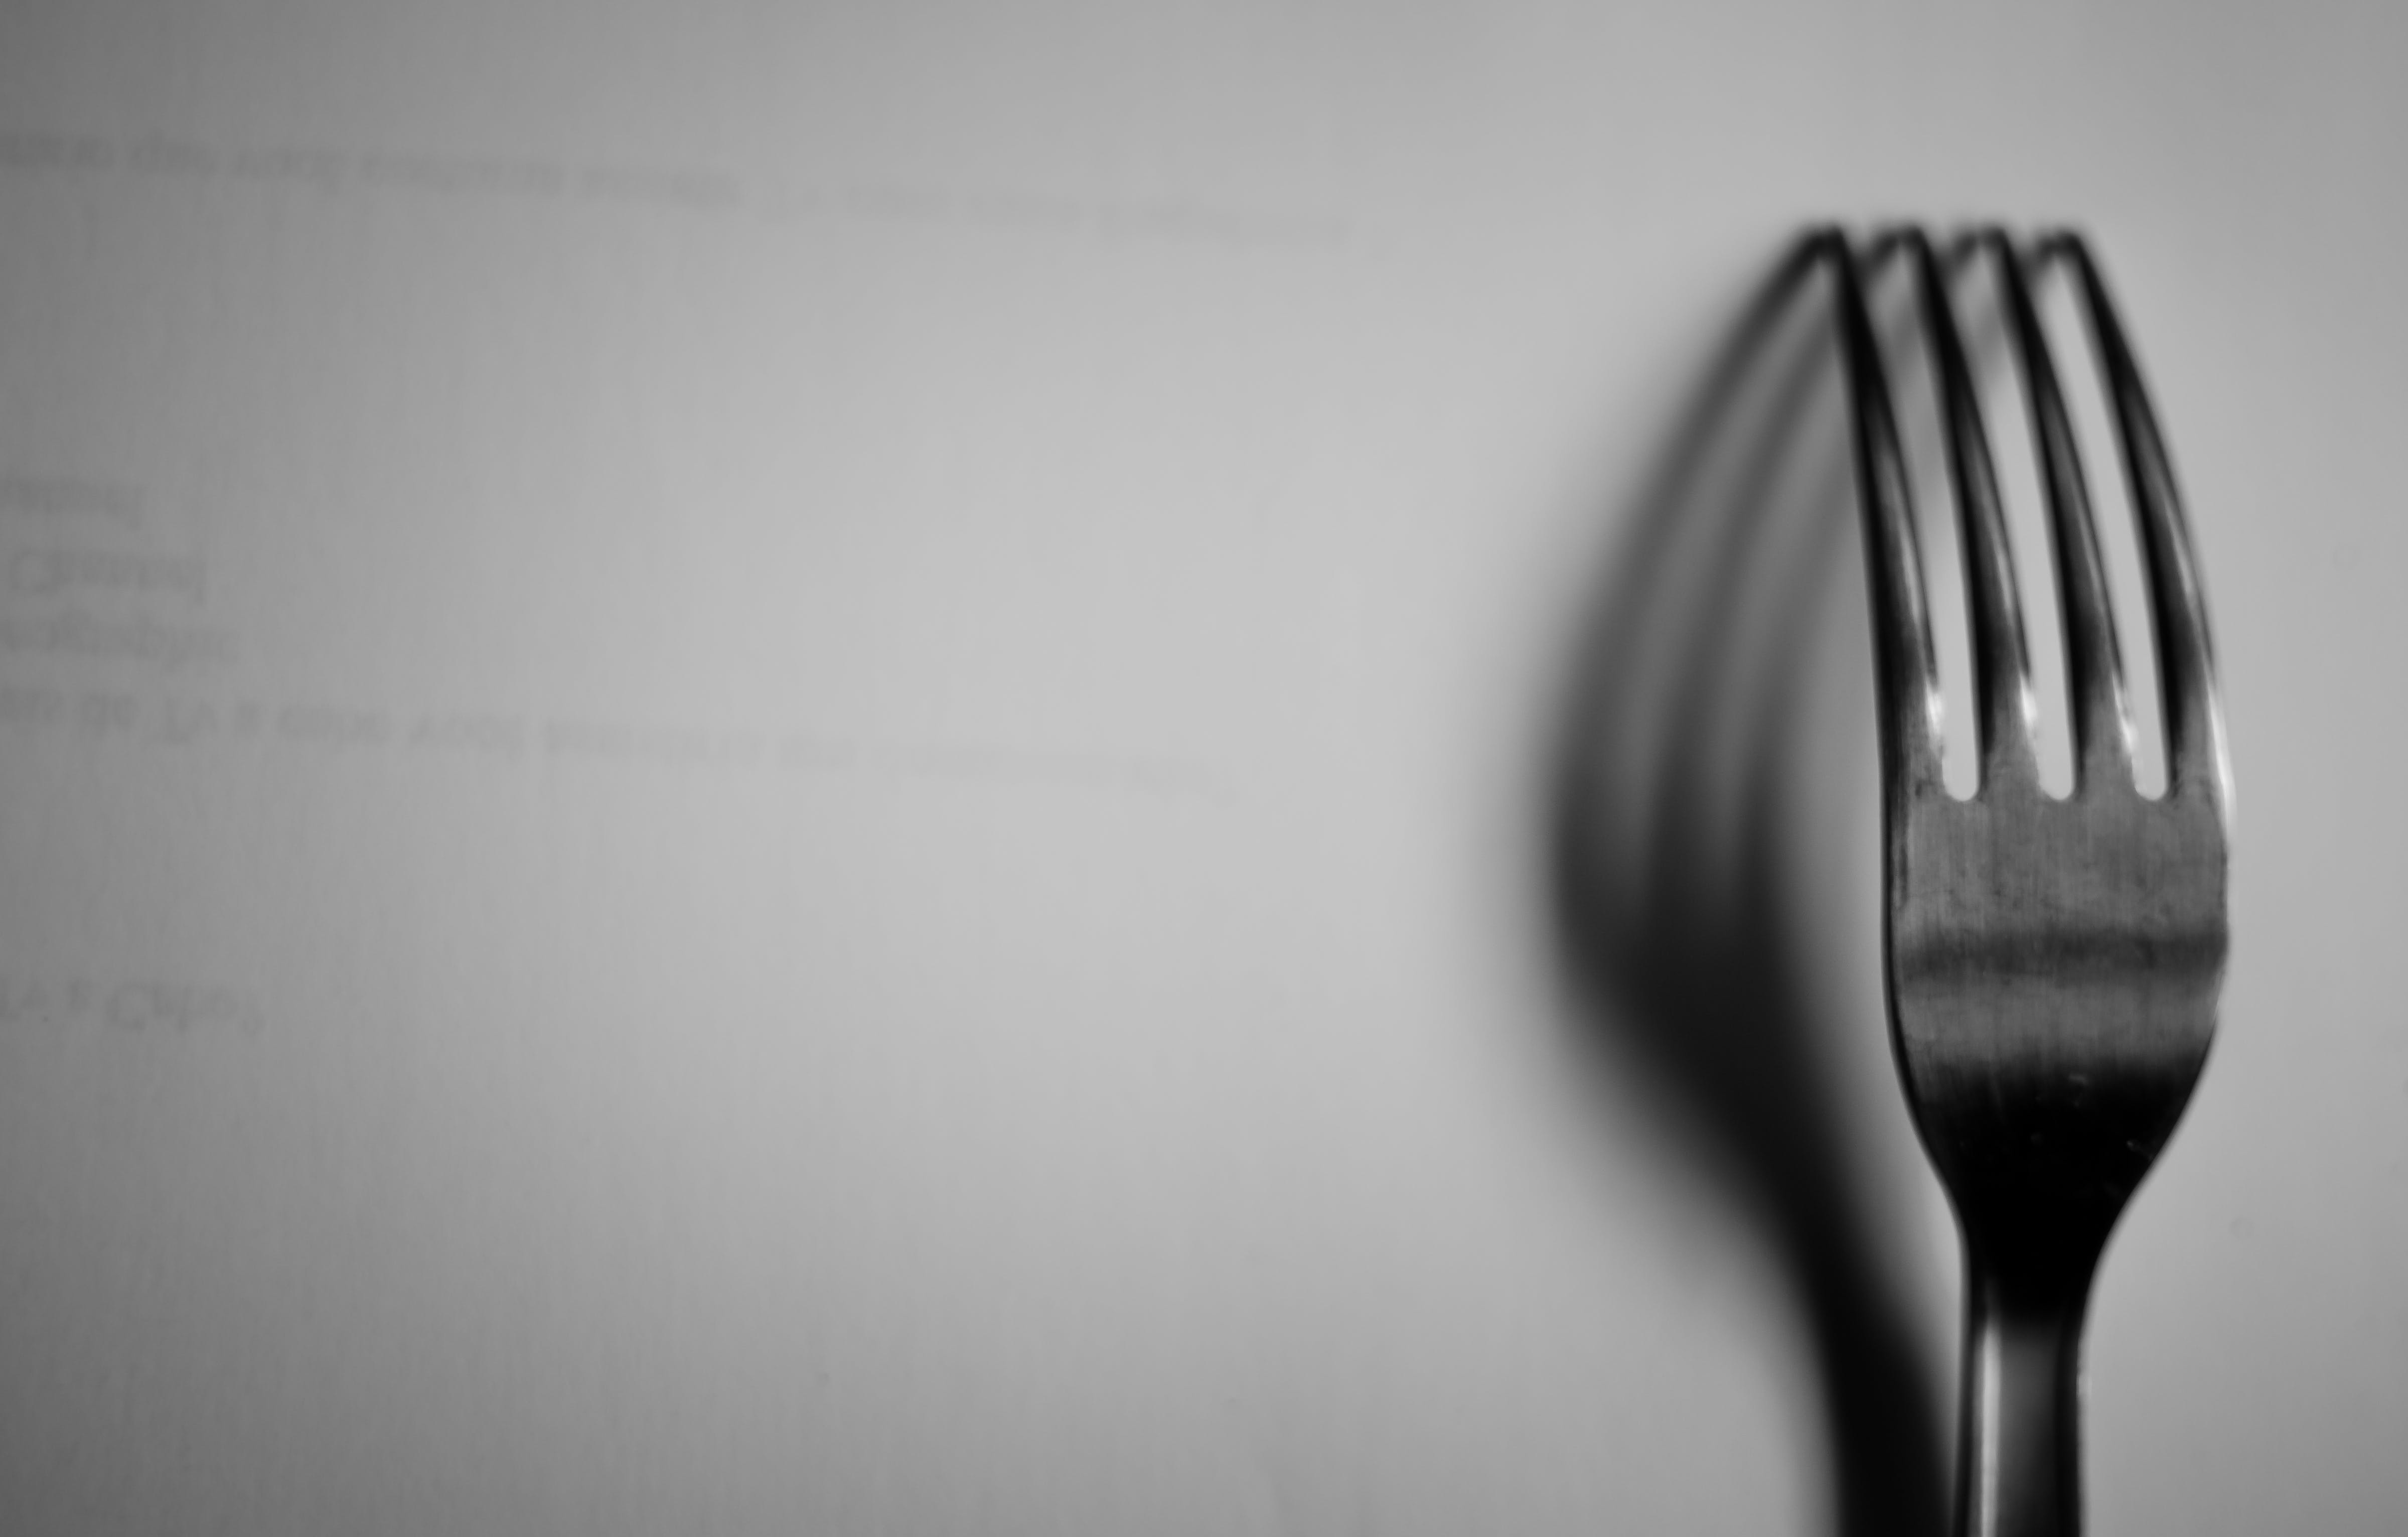 Free stock photo of light, still, shadow, fork